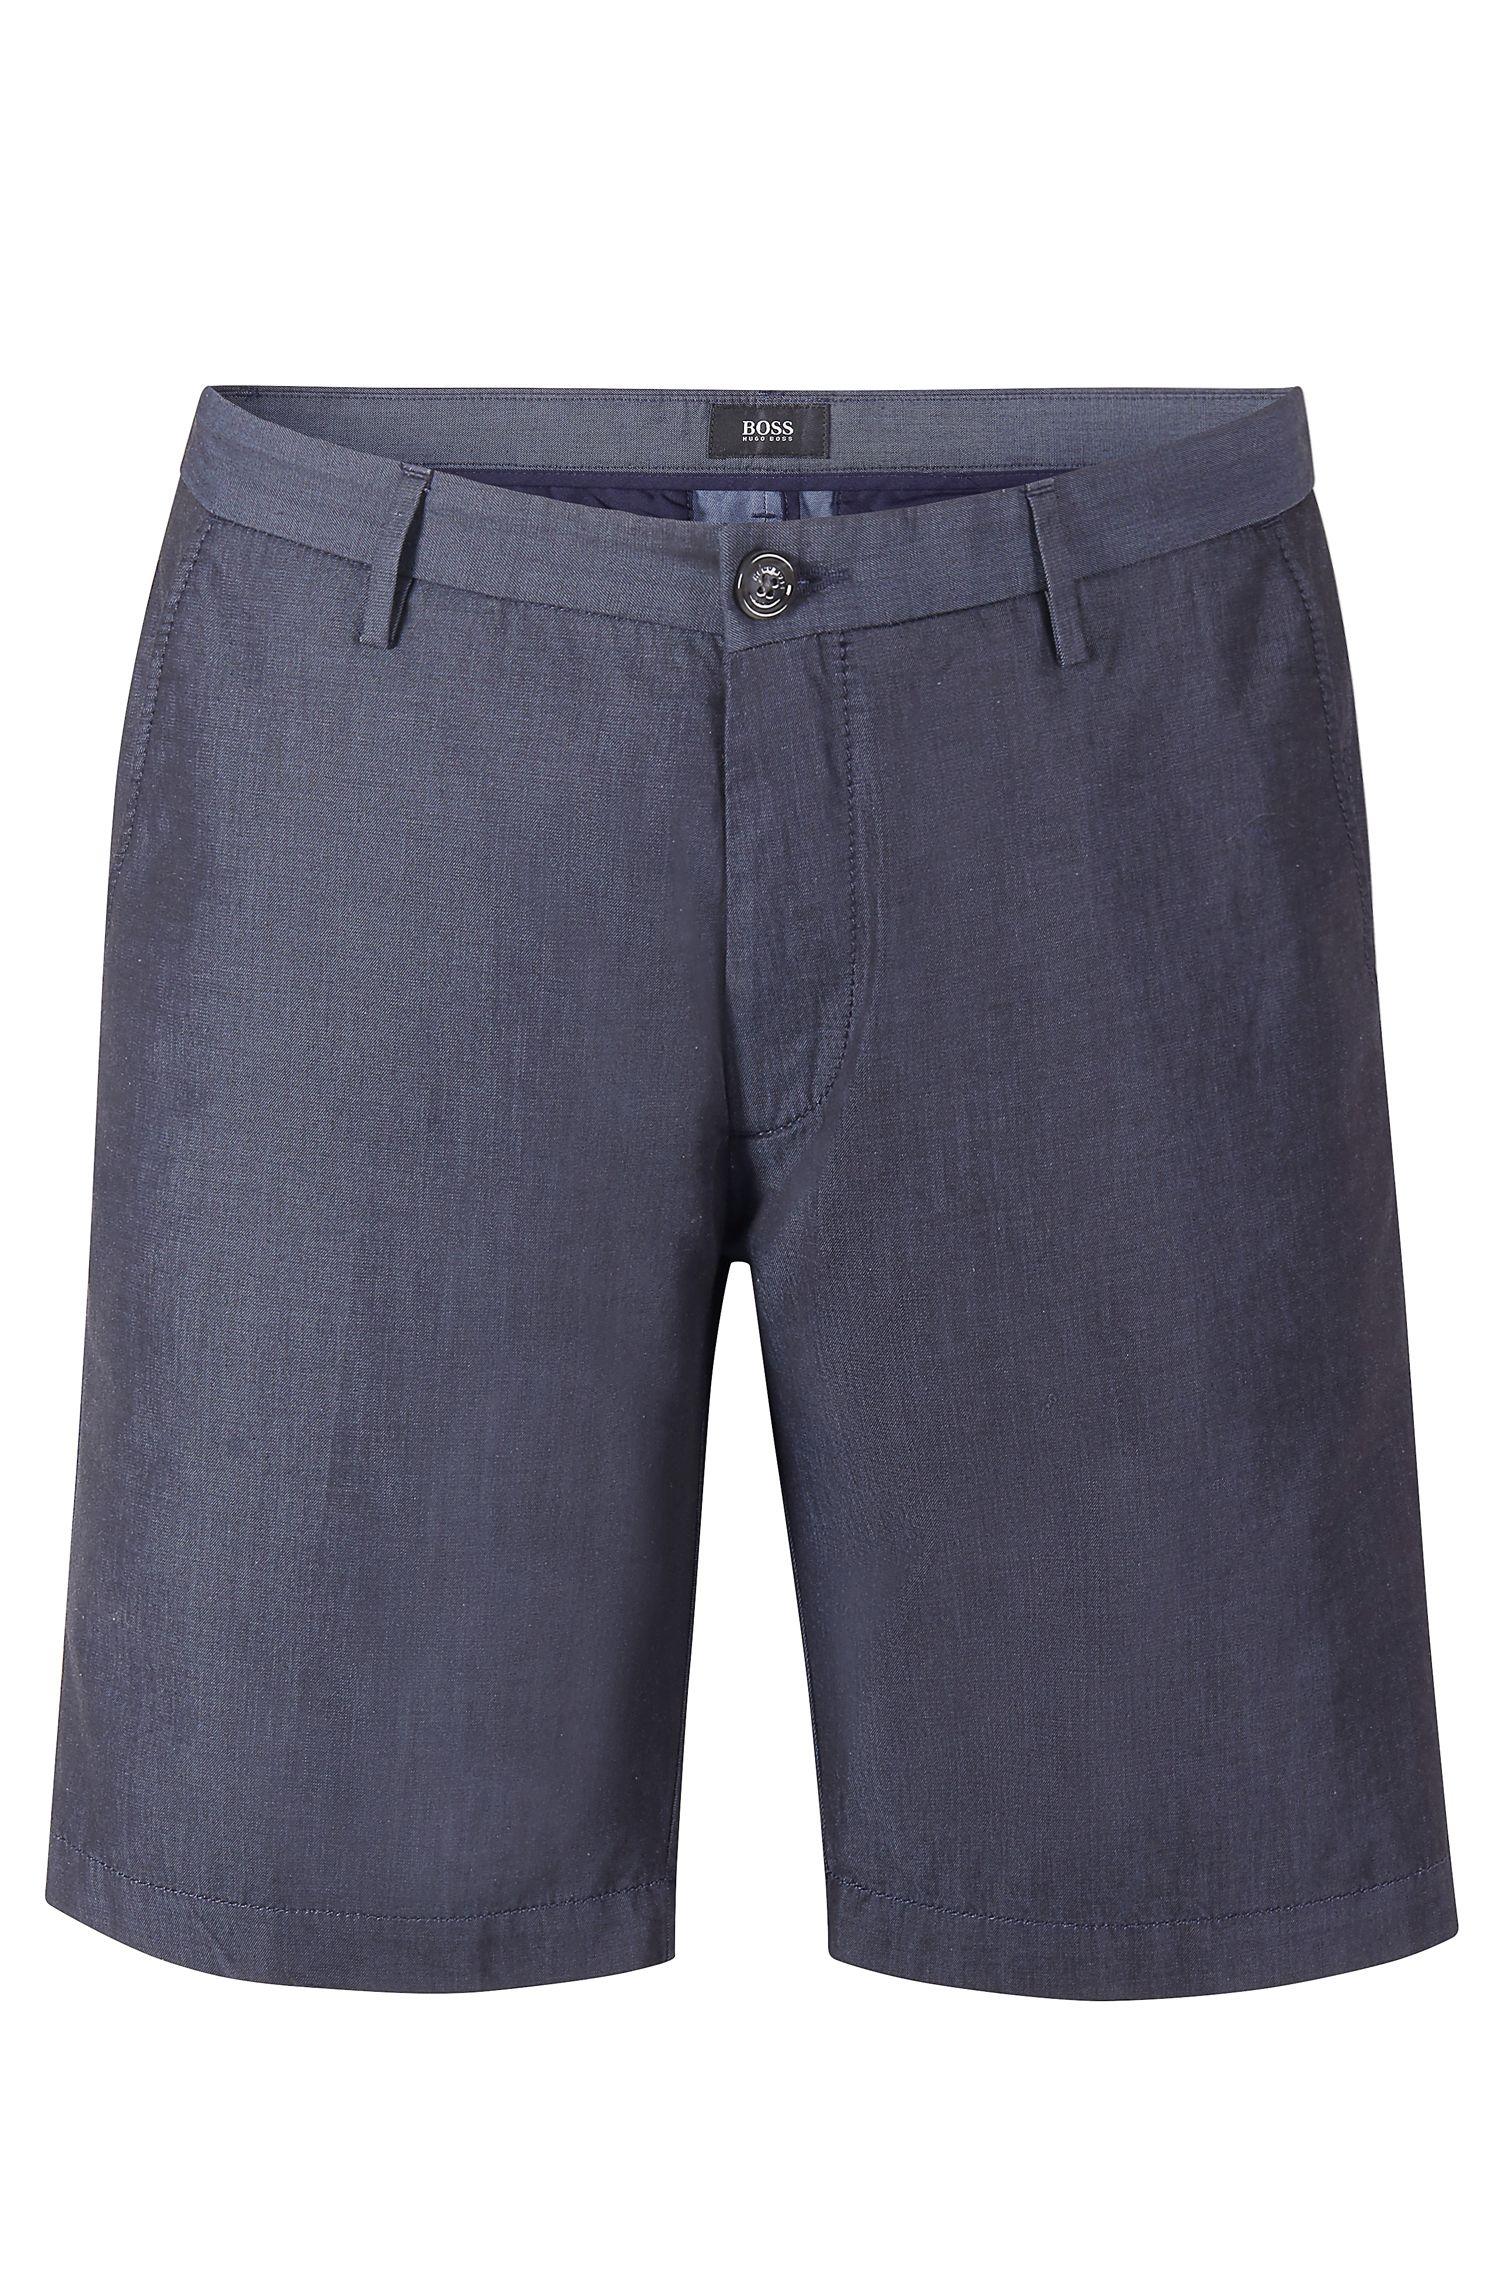 'RiceShort-W' | Slim Fit, Cotton Chambray Shorts